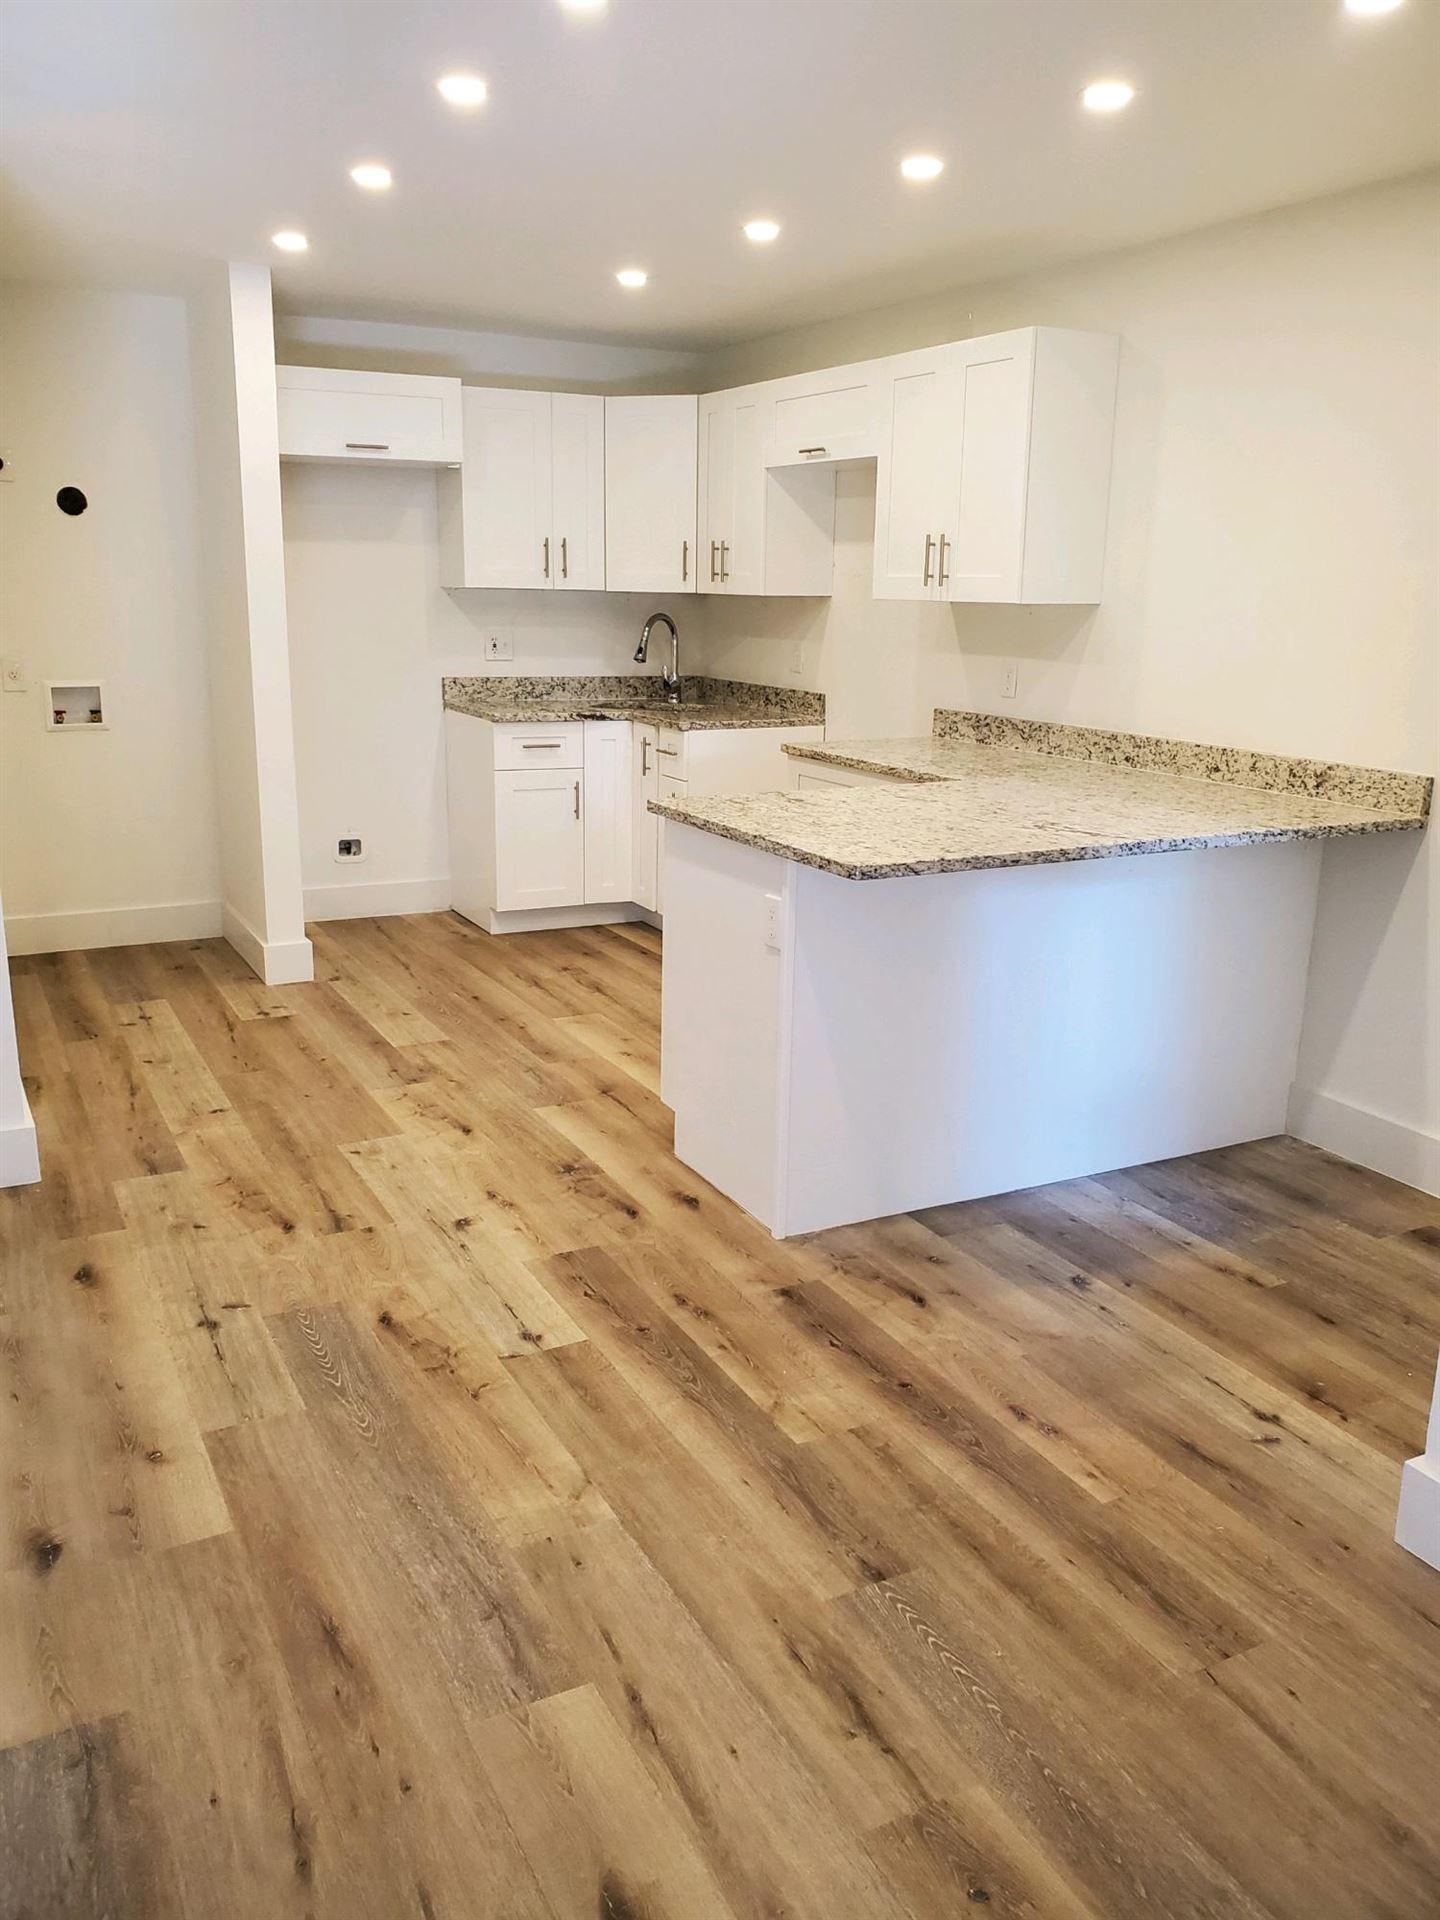 524 Shady Pine Way #C1, Greenacres, FL 33415 - #: RX-10601801